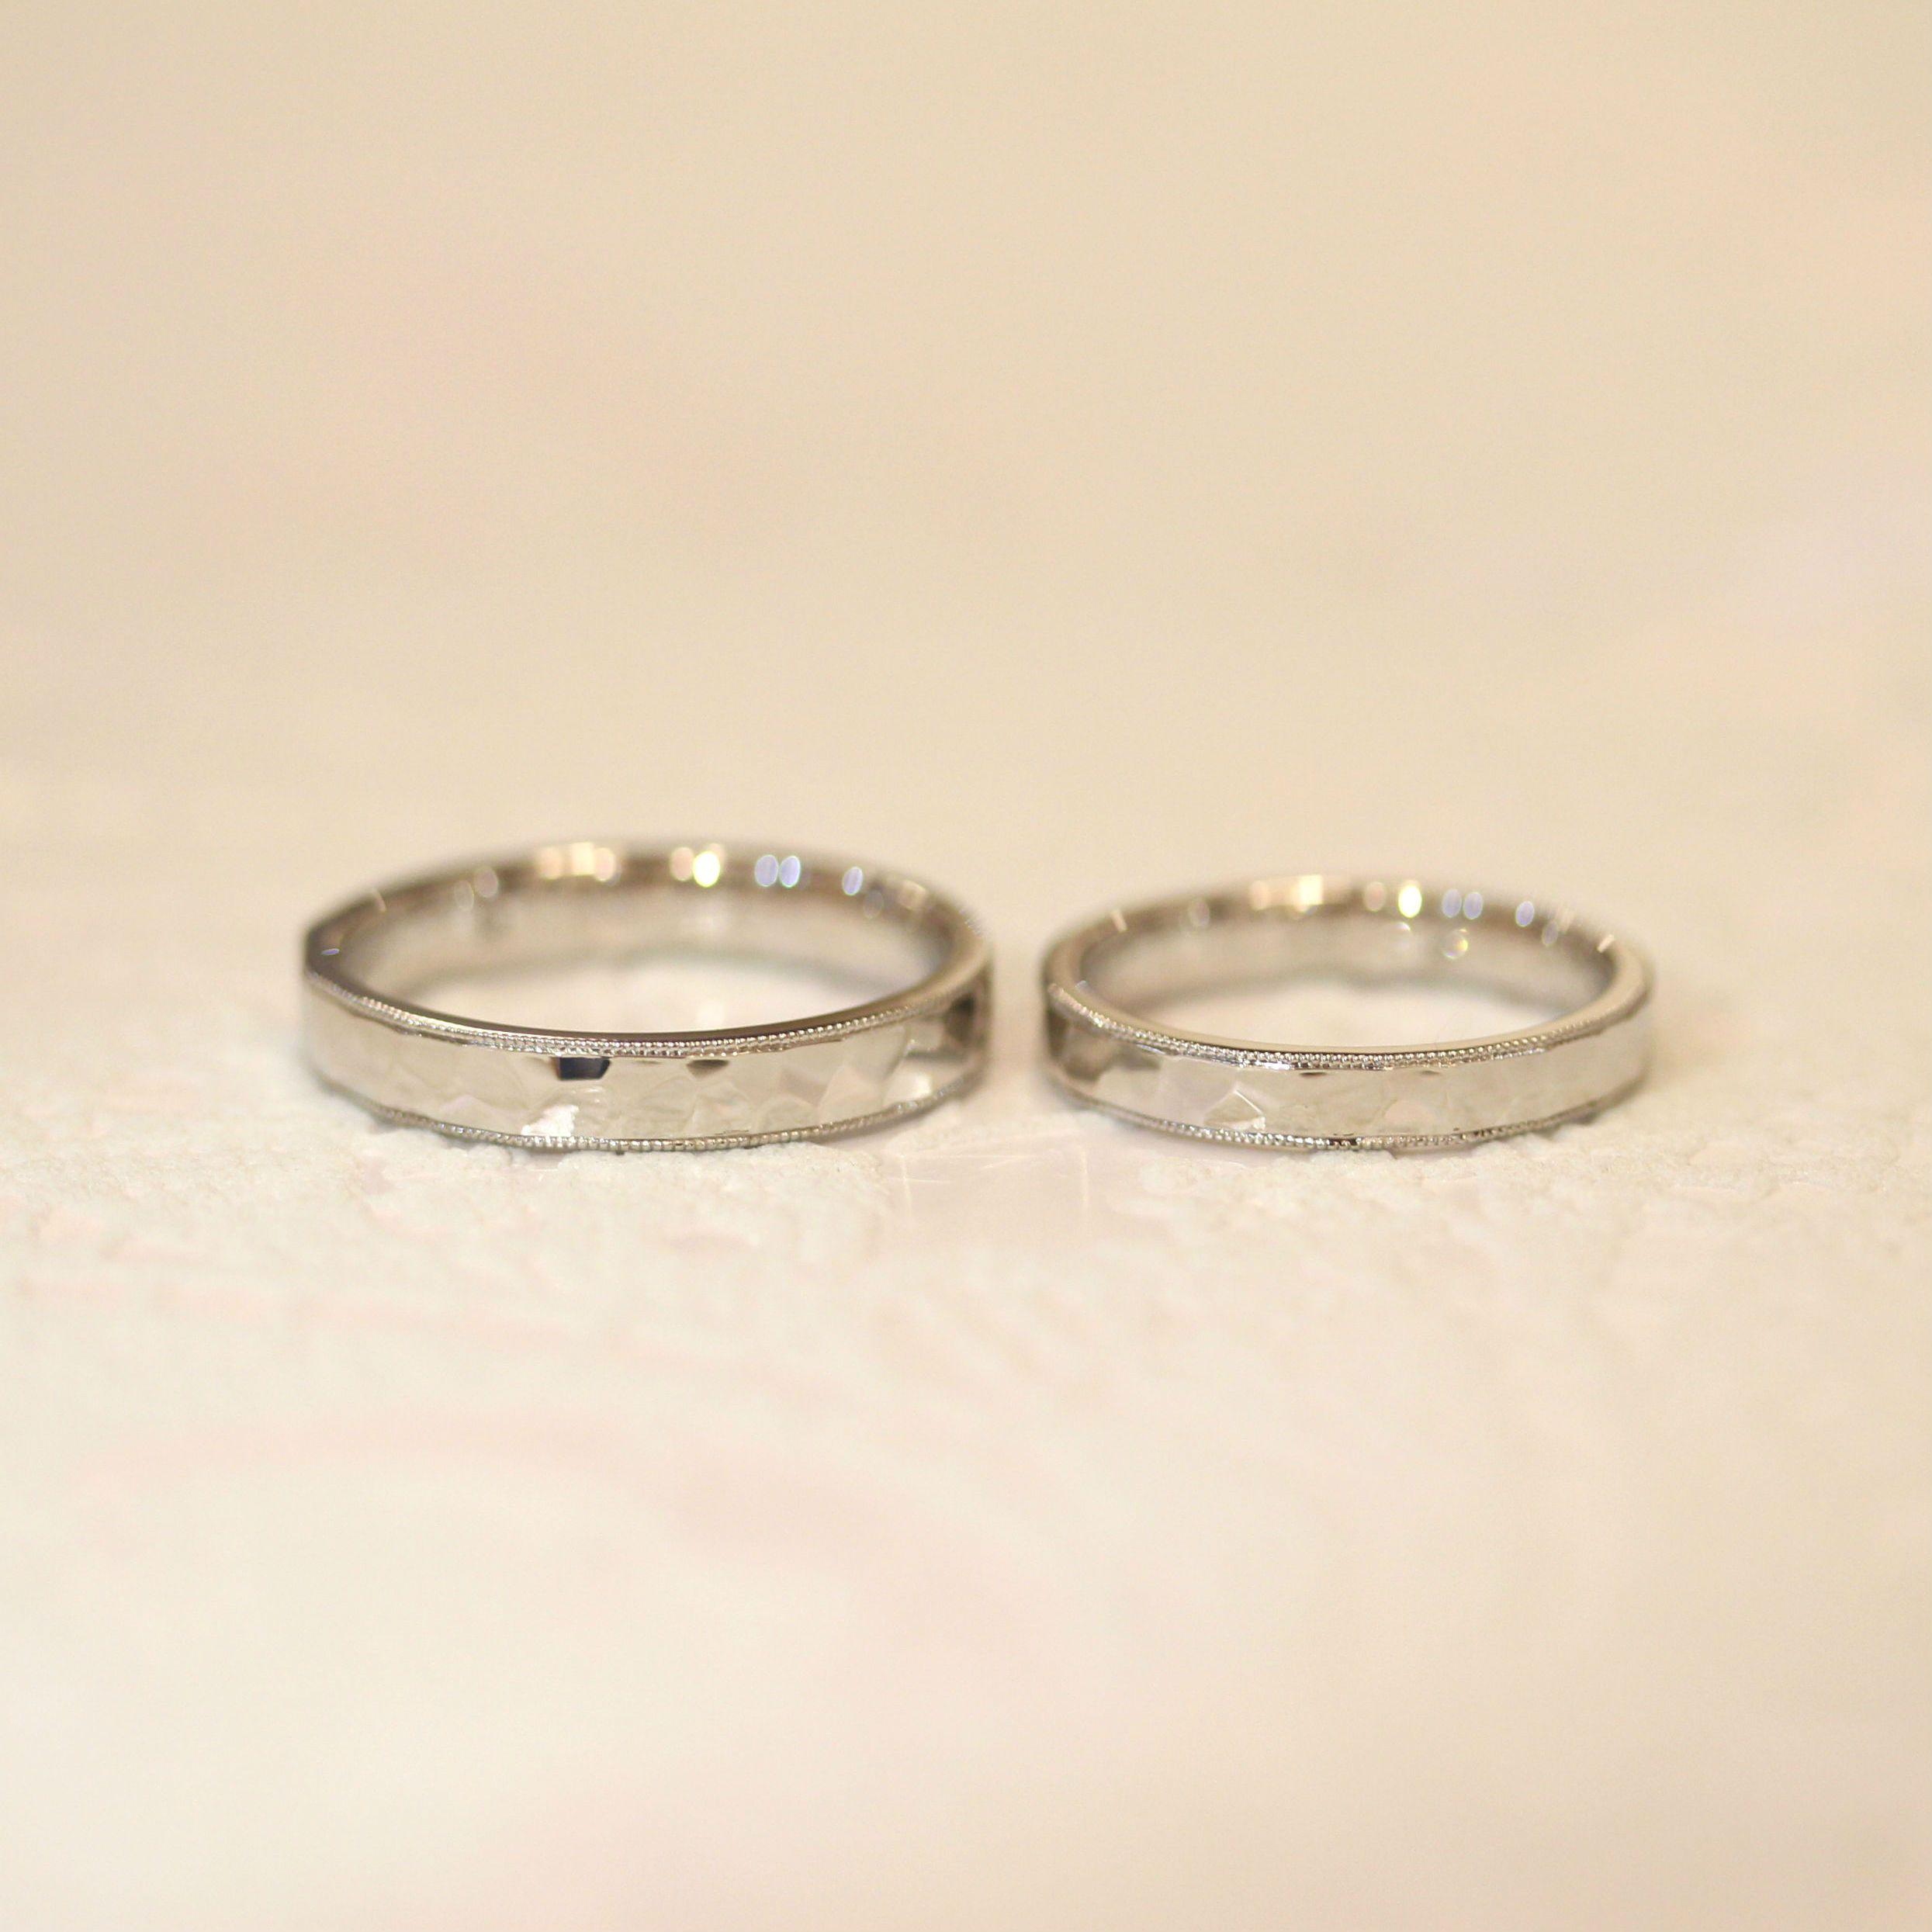 online retailer 44ea5 13e0d 銀色に輝く銀婚式記念・プラチナ仕立ての25thアニバーサリー ...